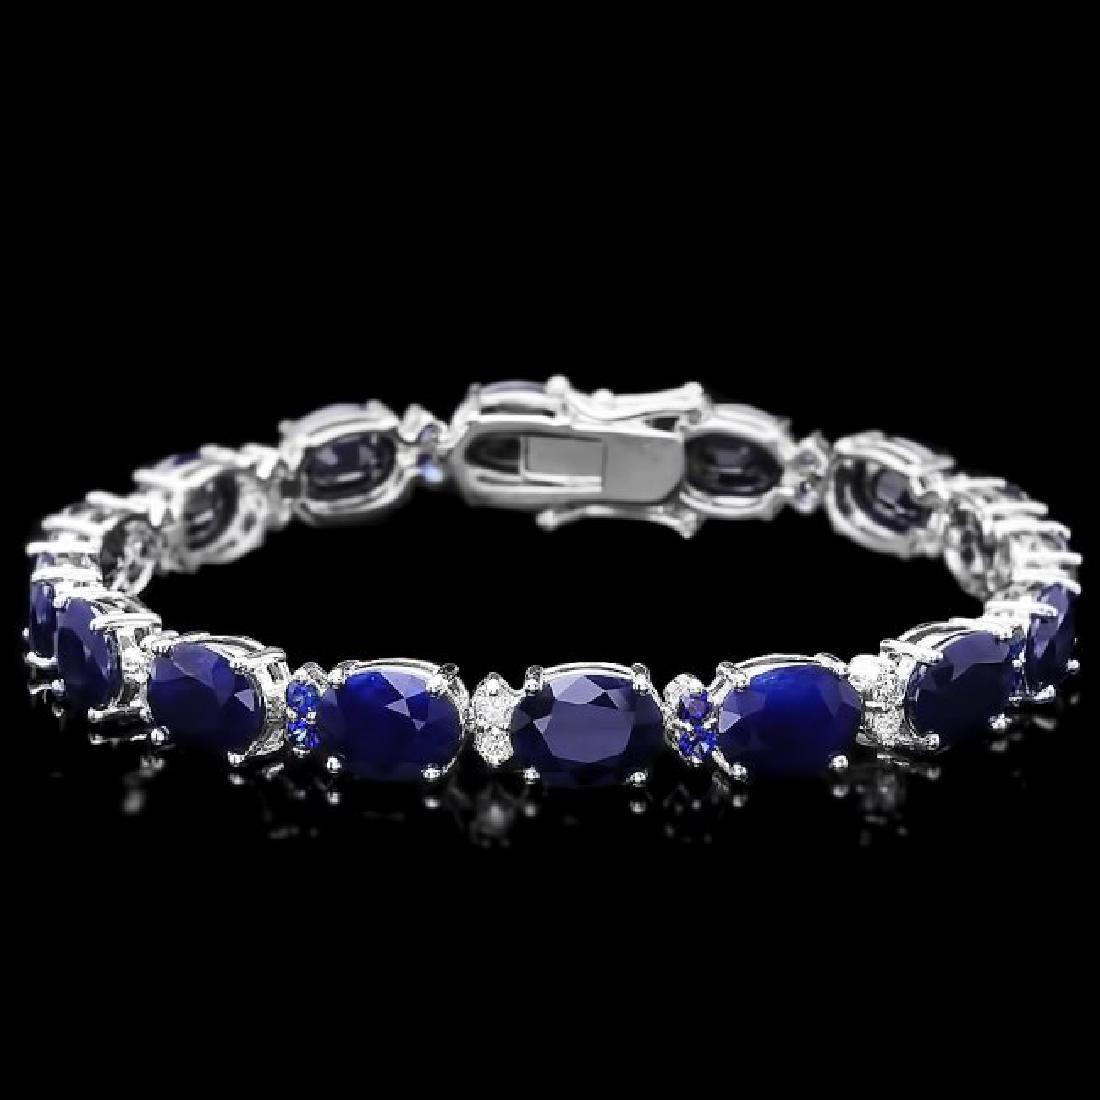 14k Gold 35.8ct Sapphire 0.75ct Diamond Bracelet